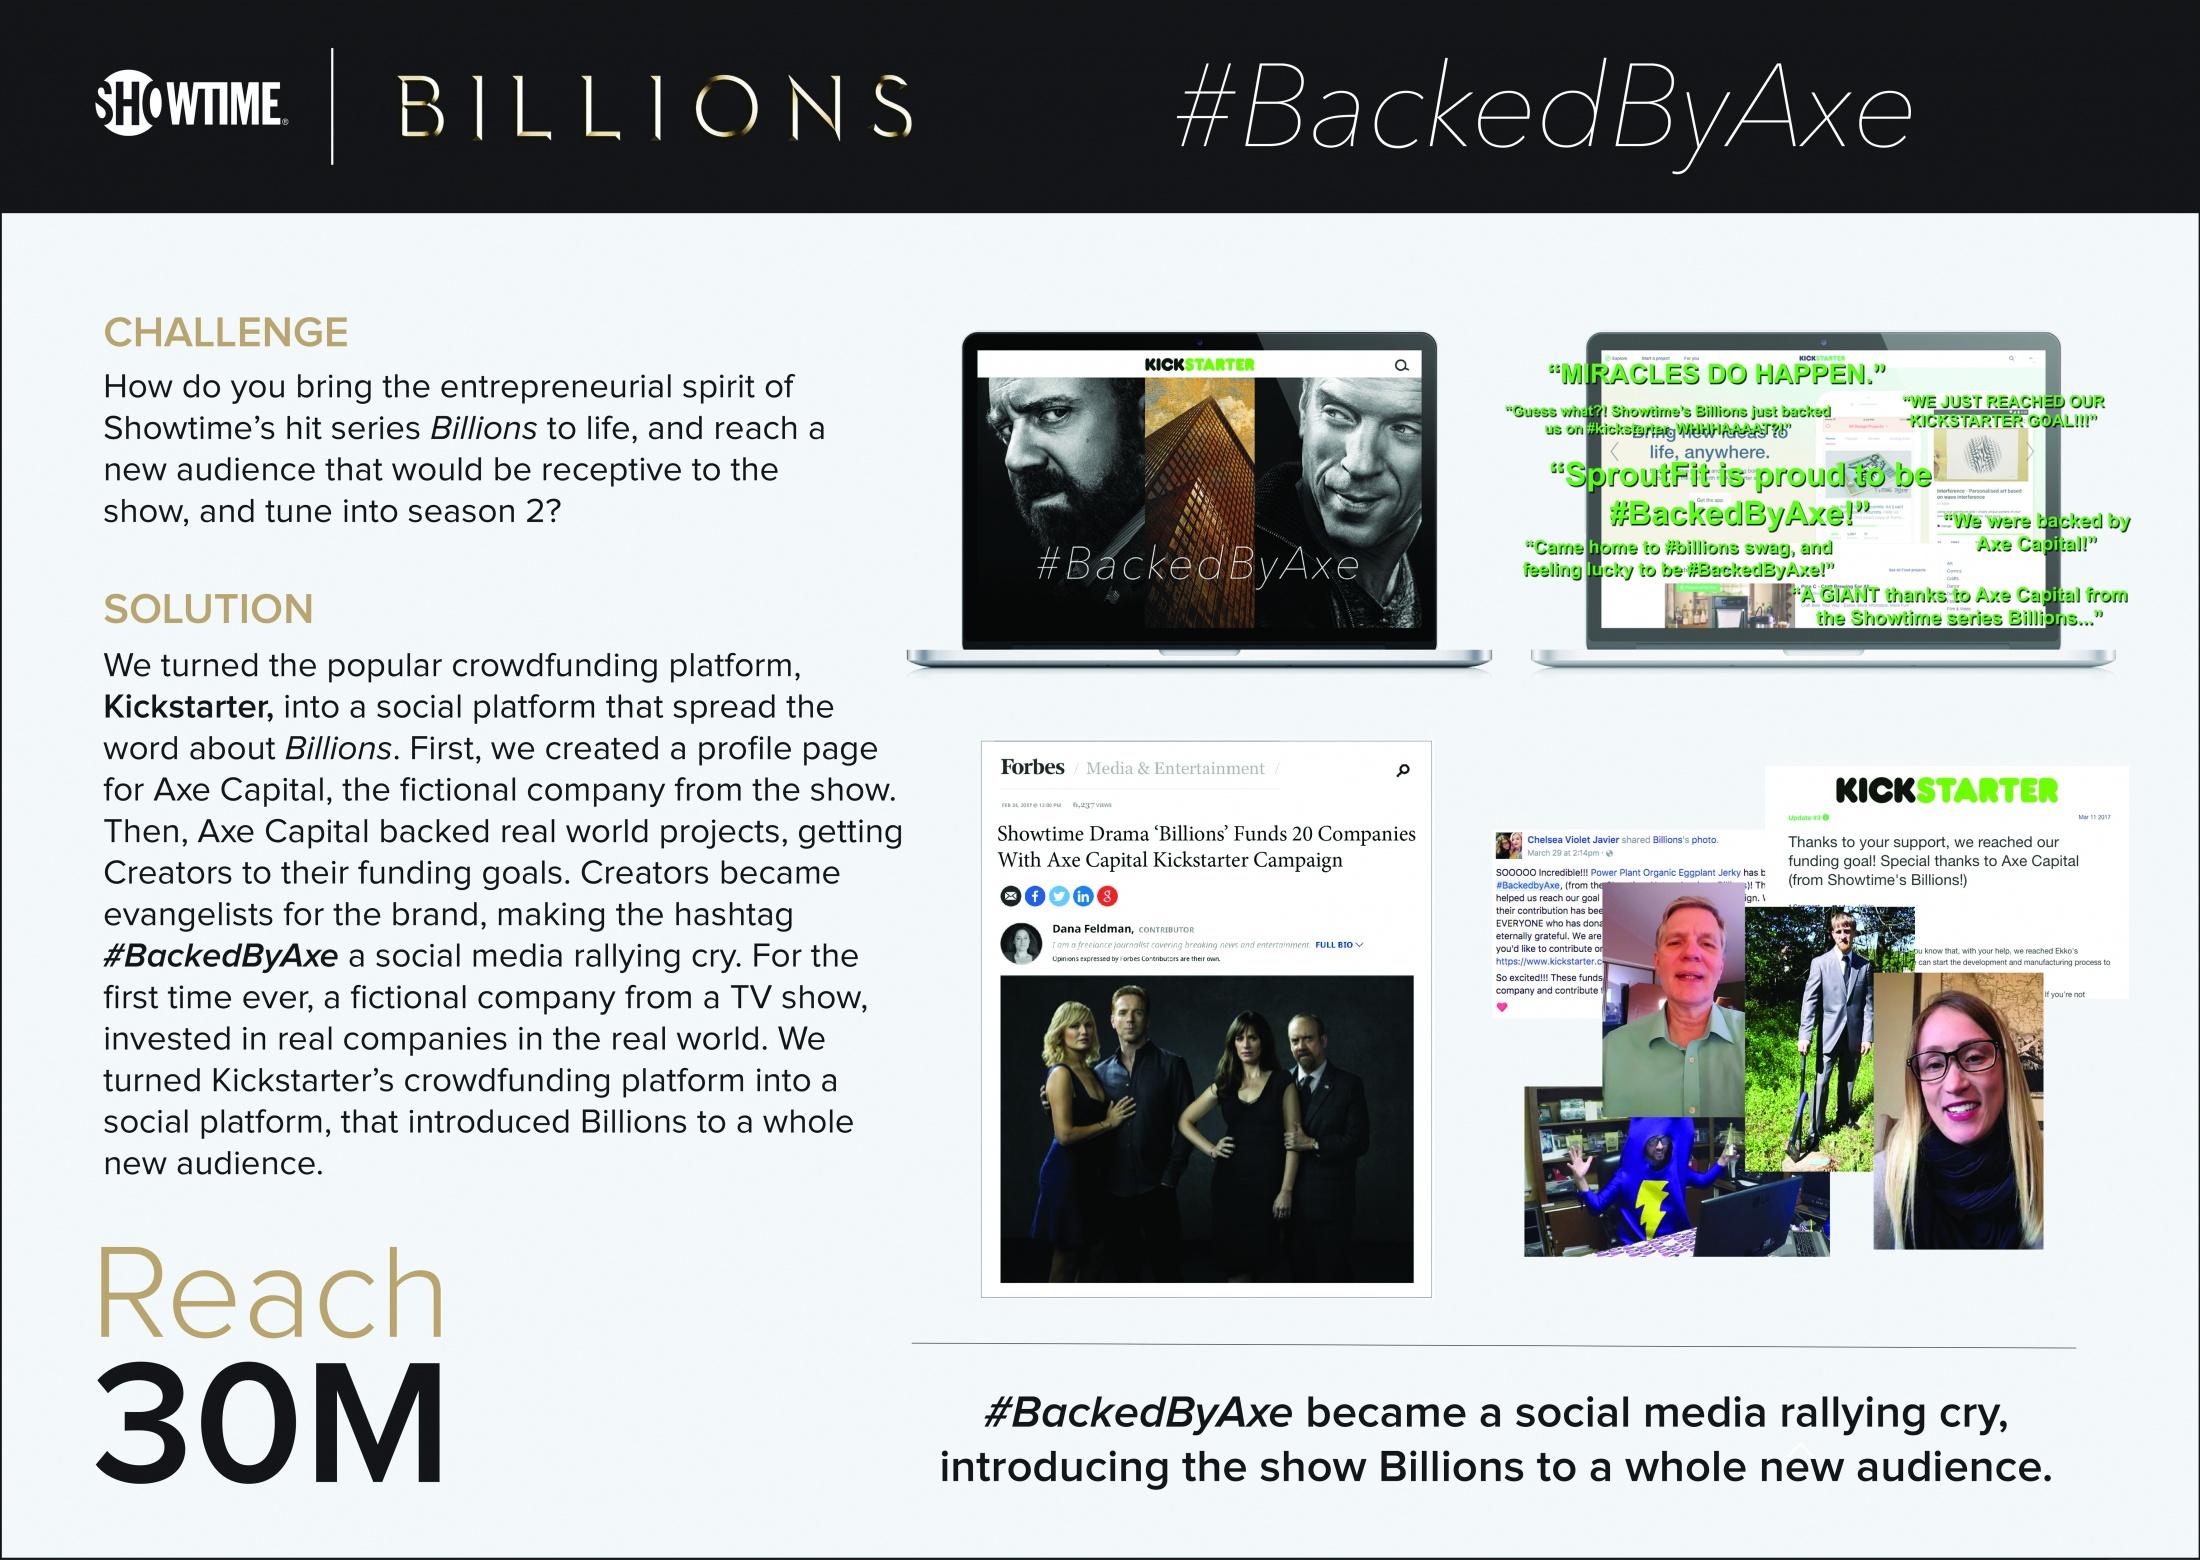 Thumbnail for #BackedByAxe